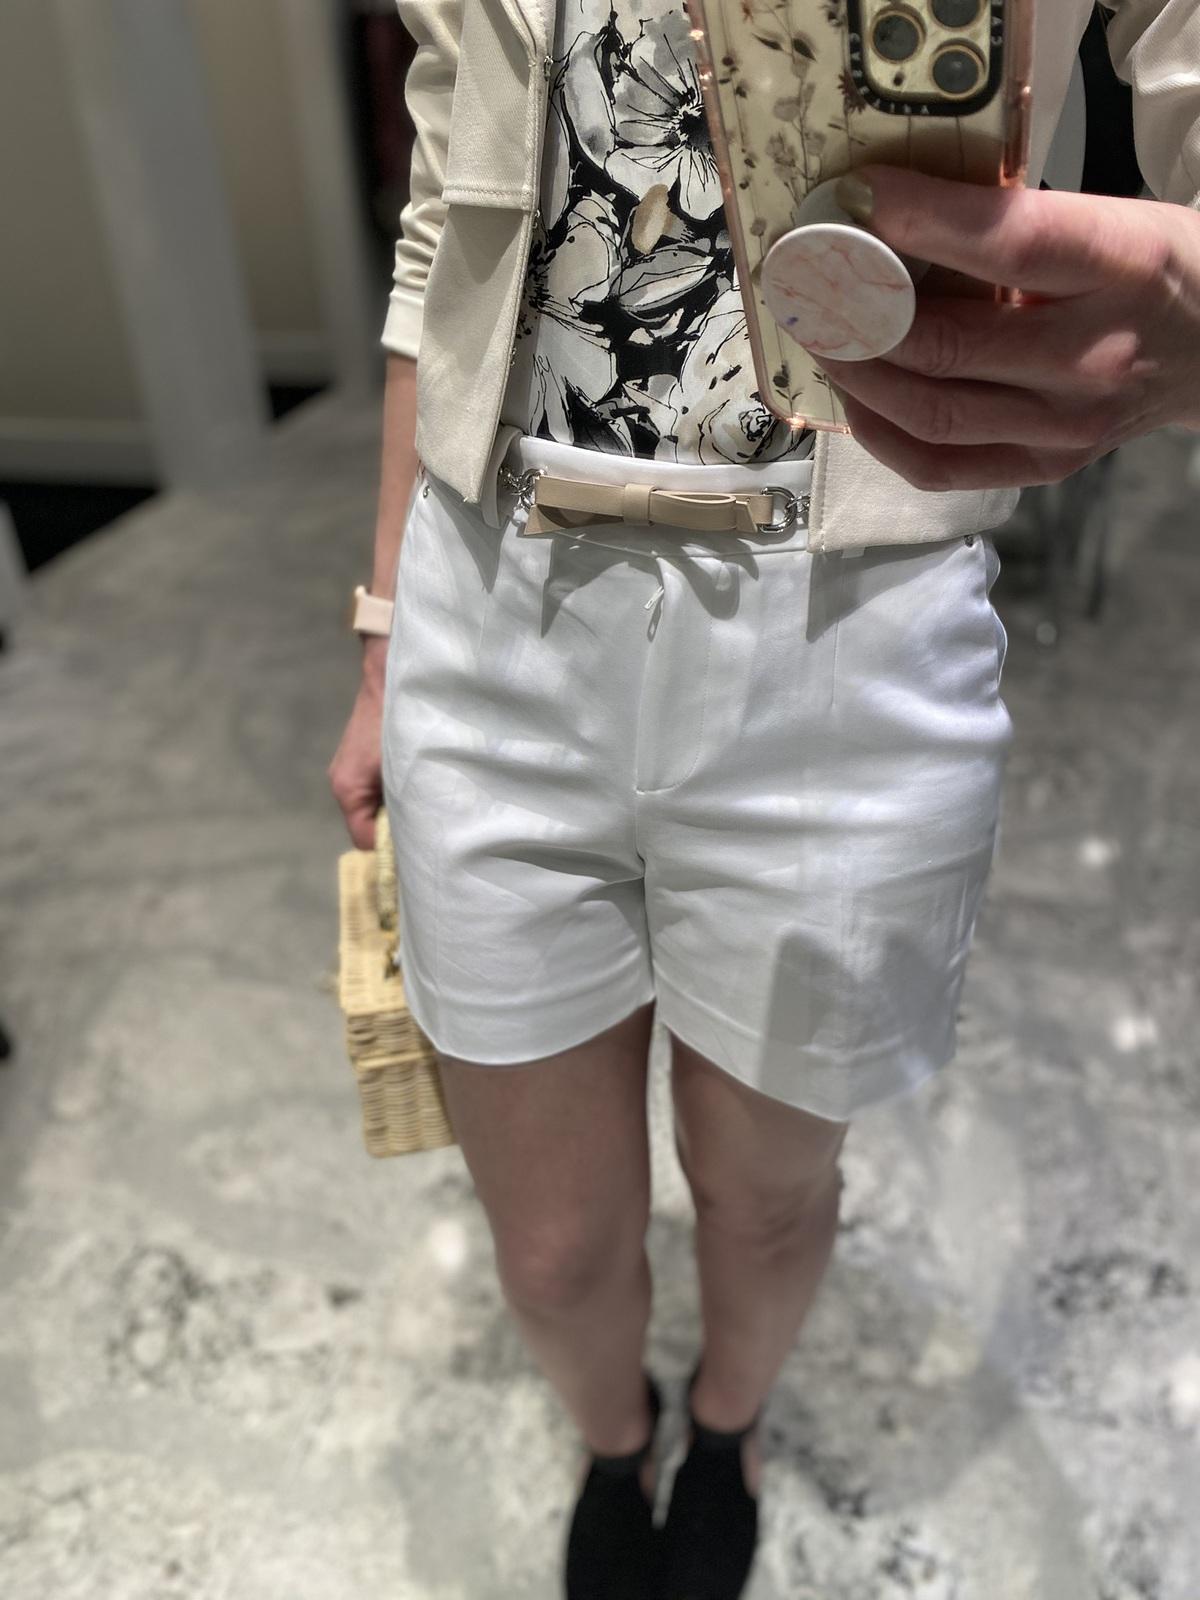 Mirror selfie of woman over 50 wearing white shorts floral shirt cream jacket carrying wicker handbag doing spring wardrobe update